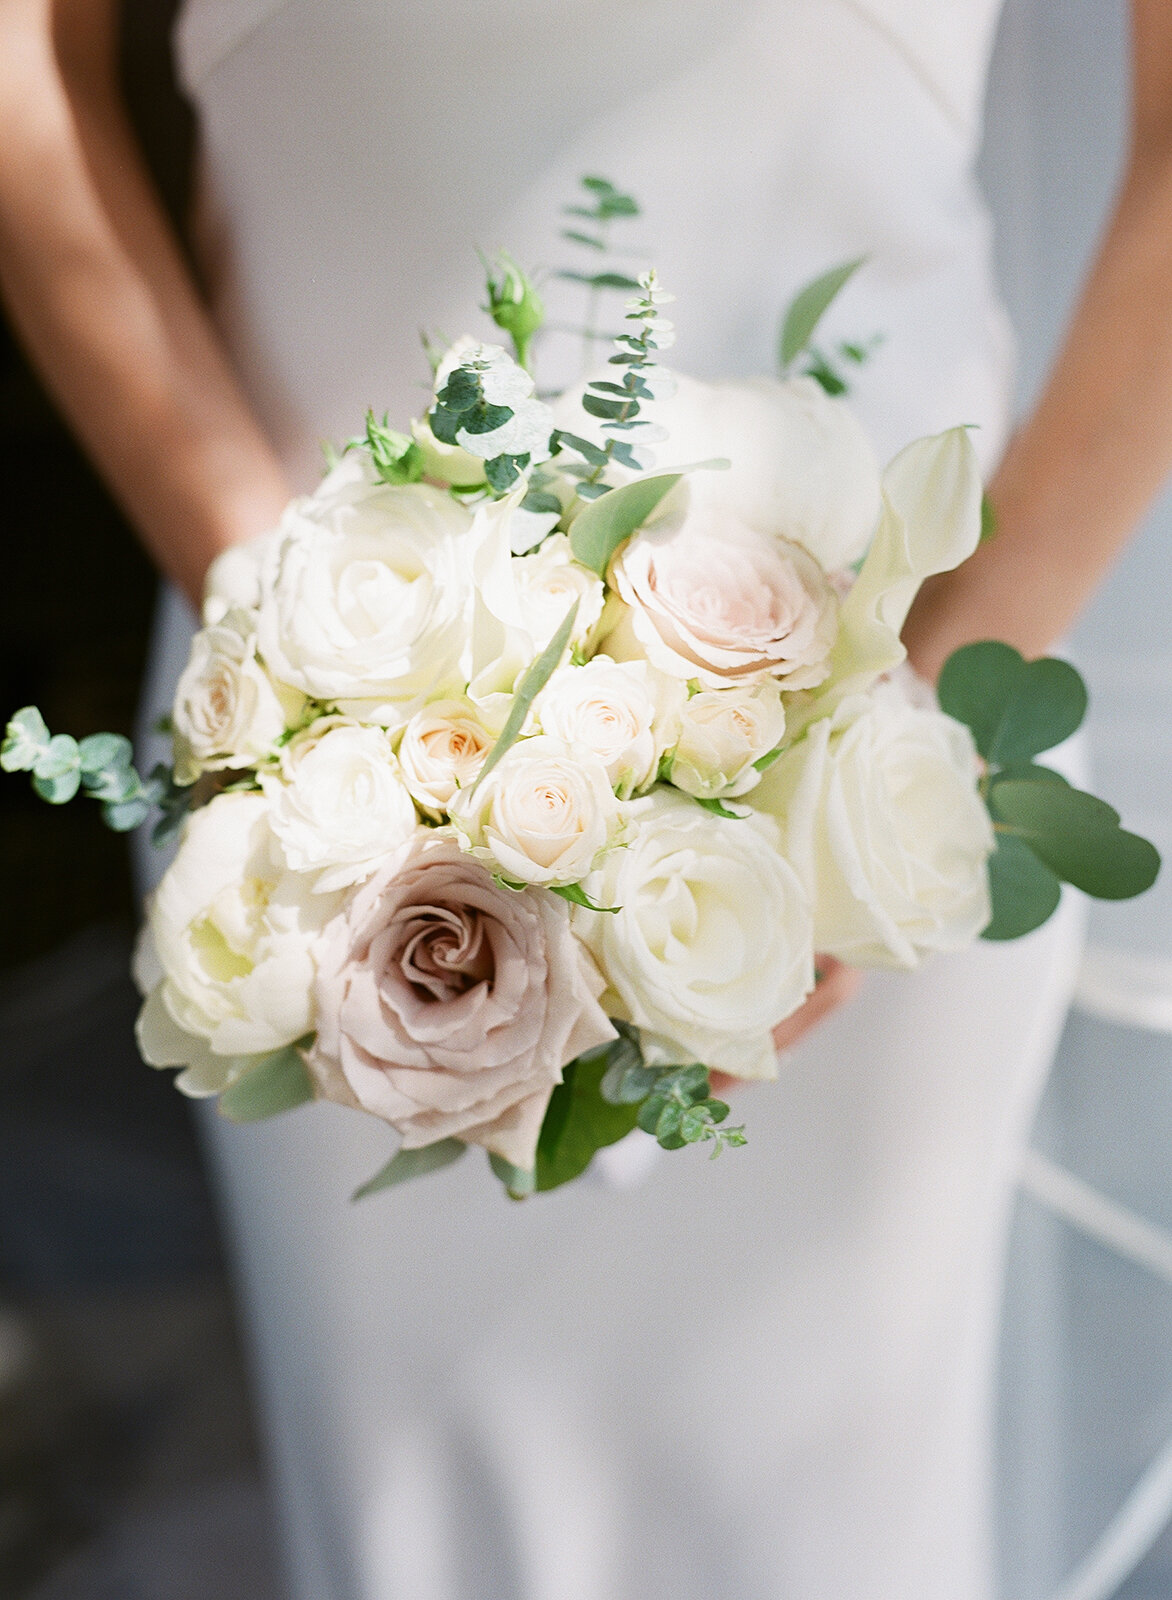 White-Garden-Rose-bride-bouquet-williamsburg-photo-studios